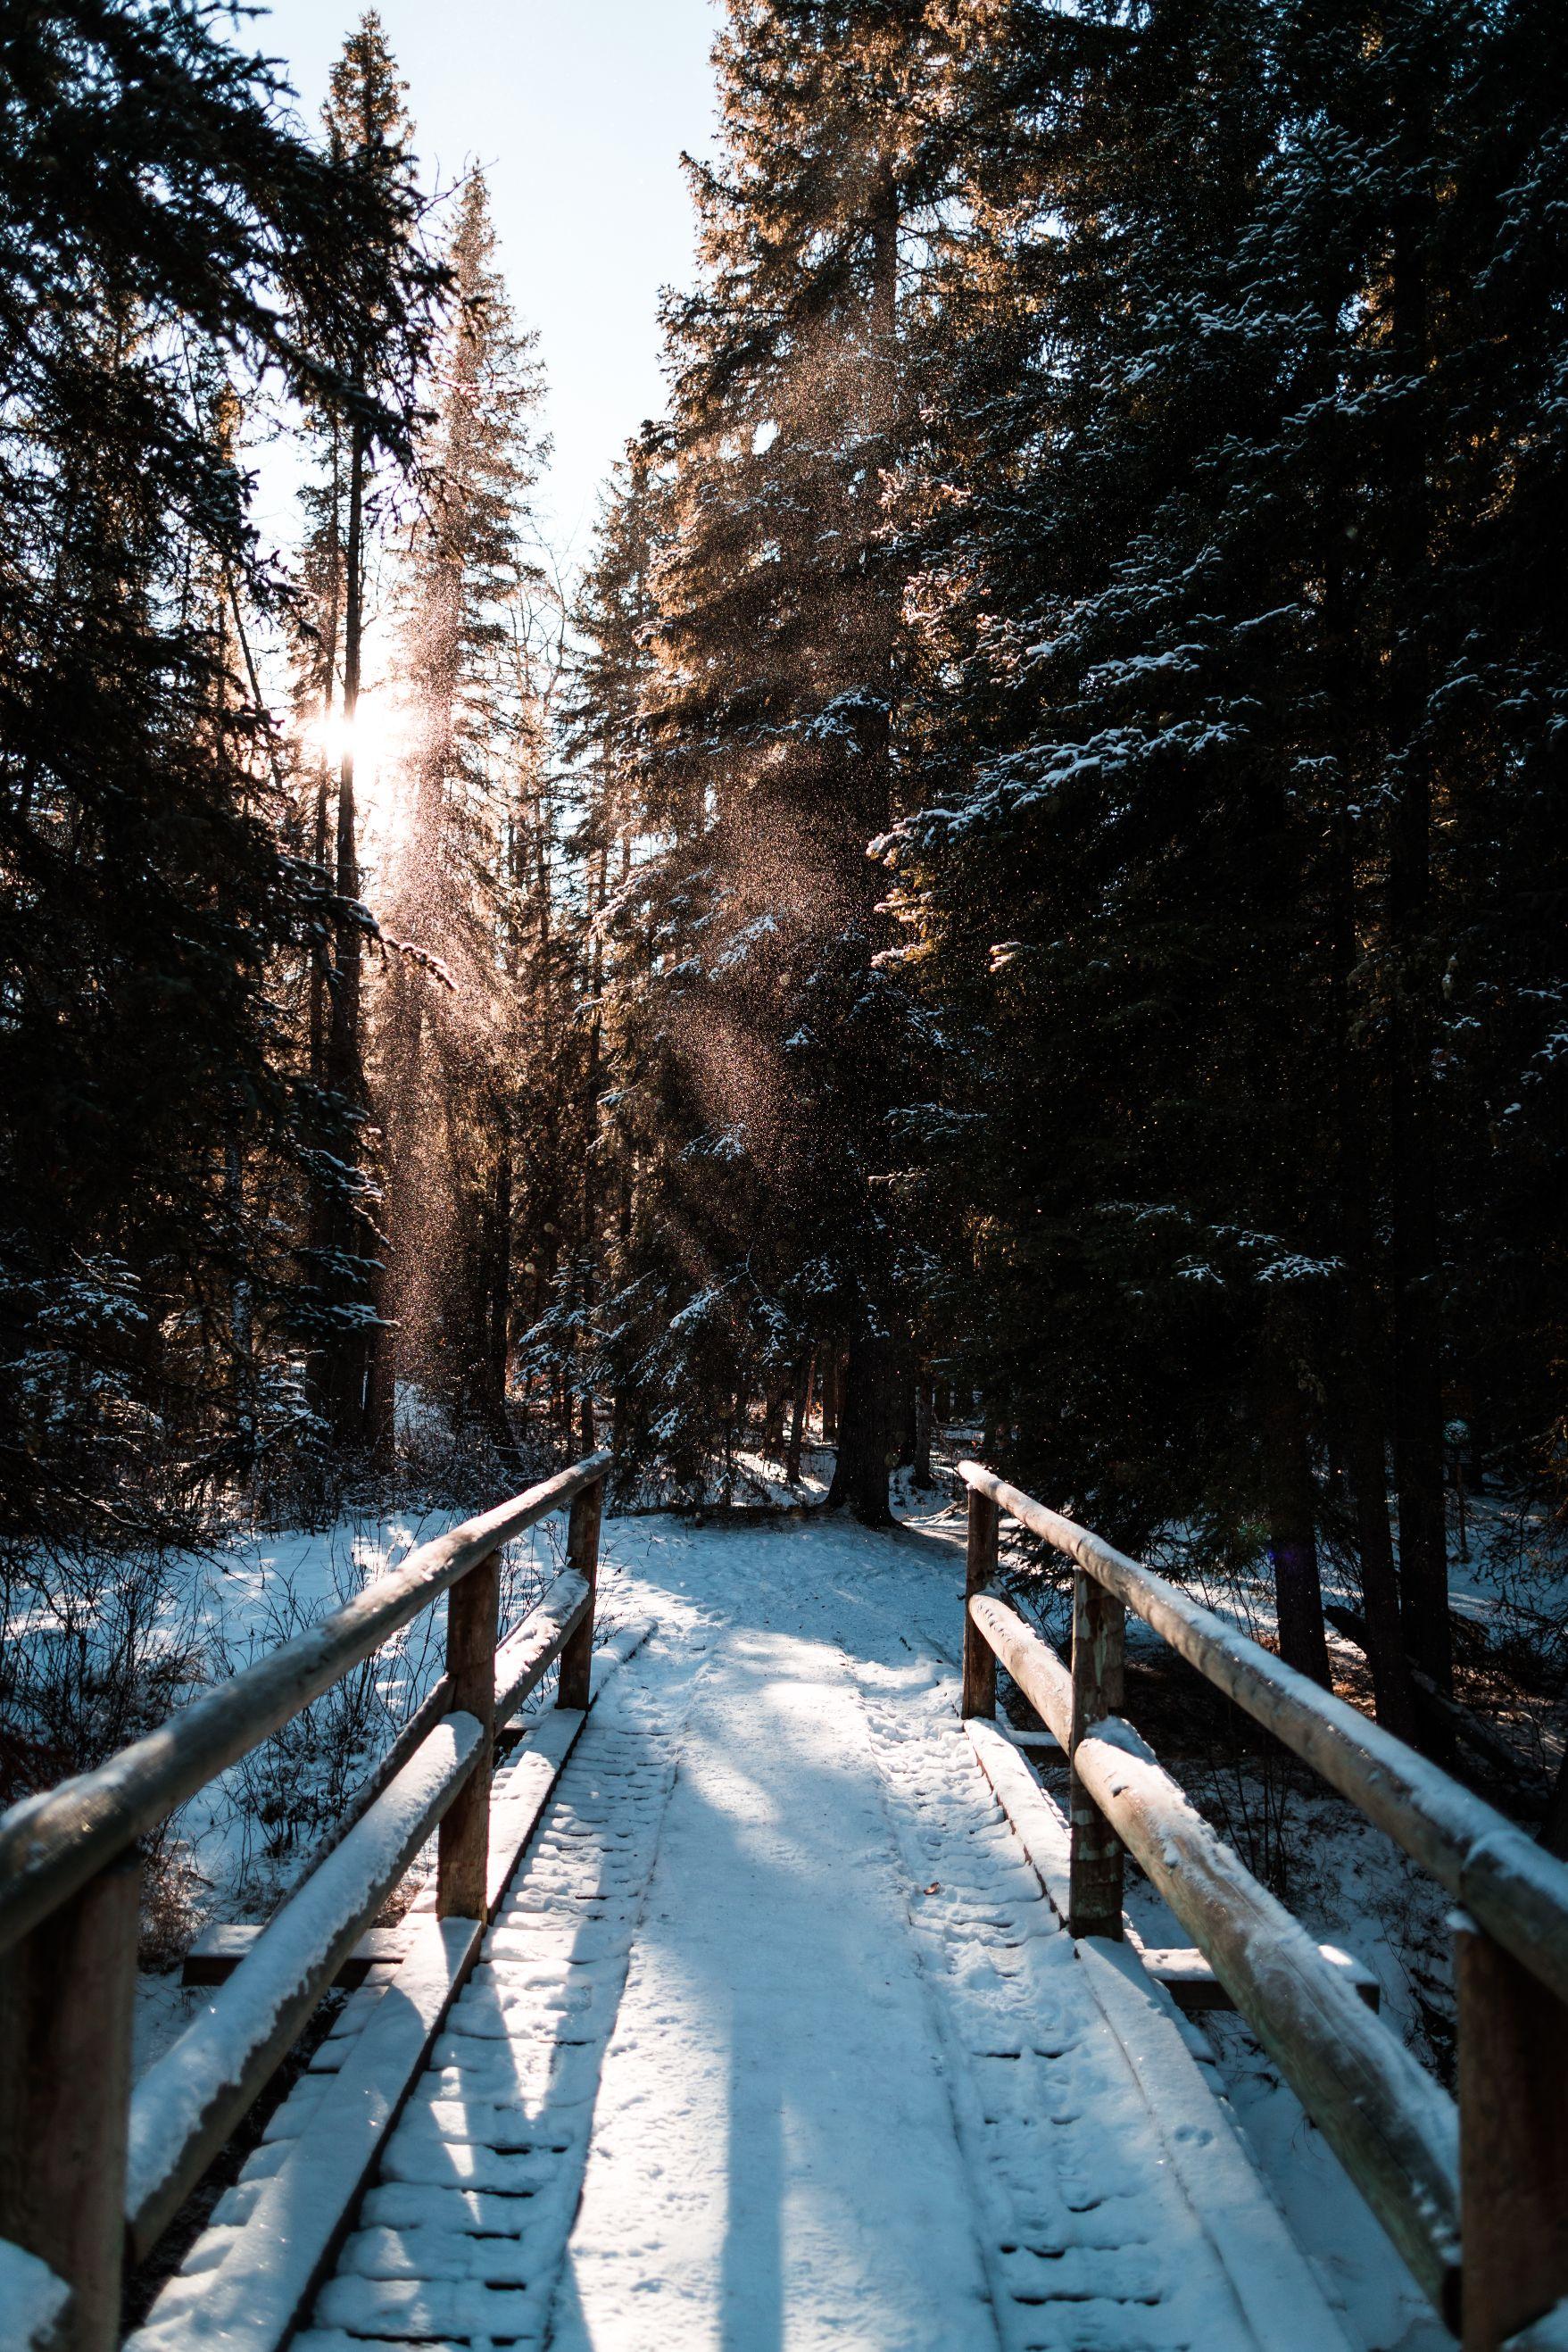 Snowy bridge into forest.